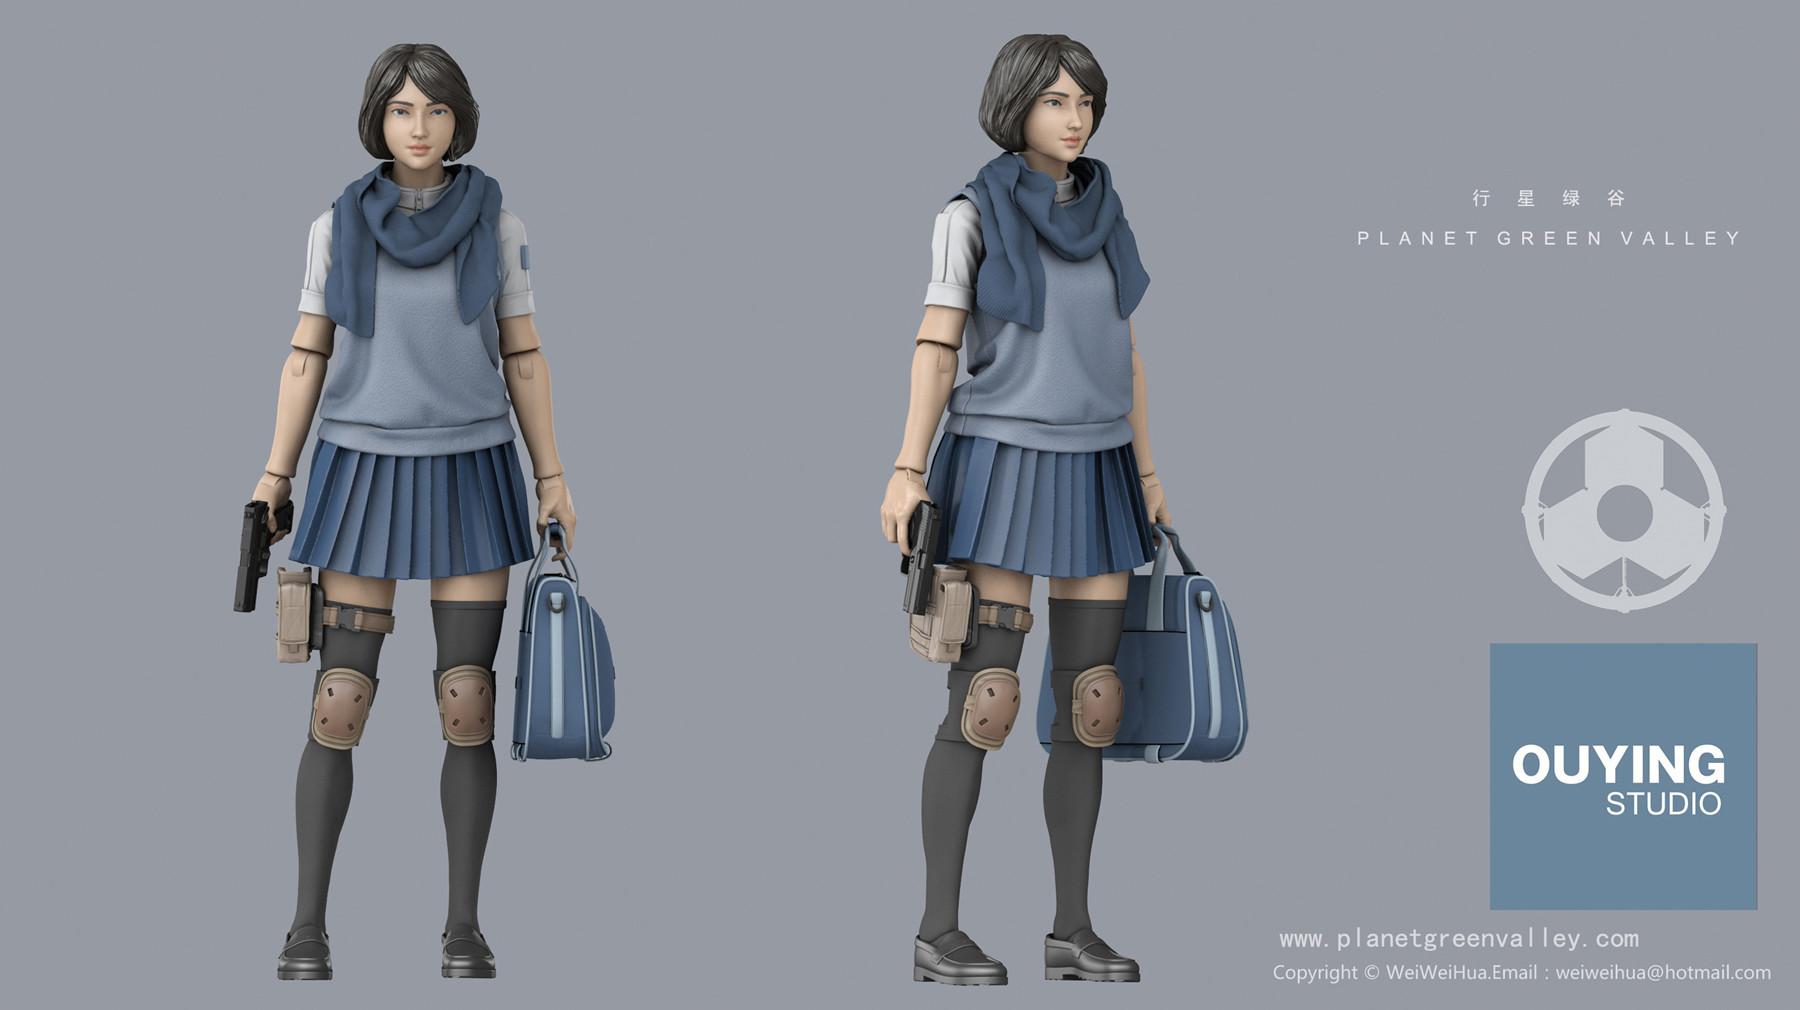 ArtStation - PGV_ 1:18 Scale action figure female